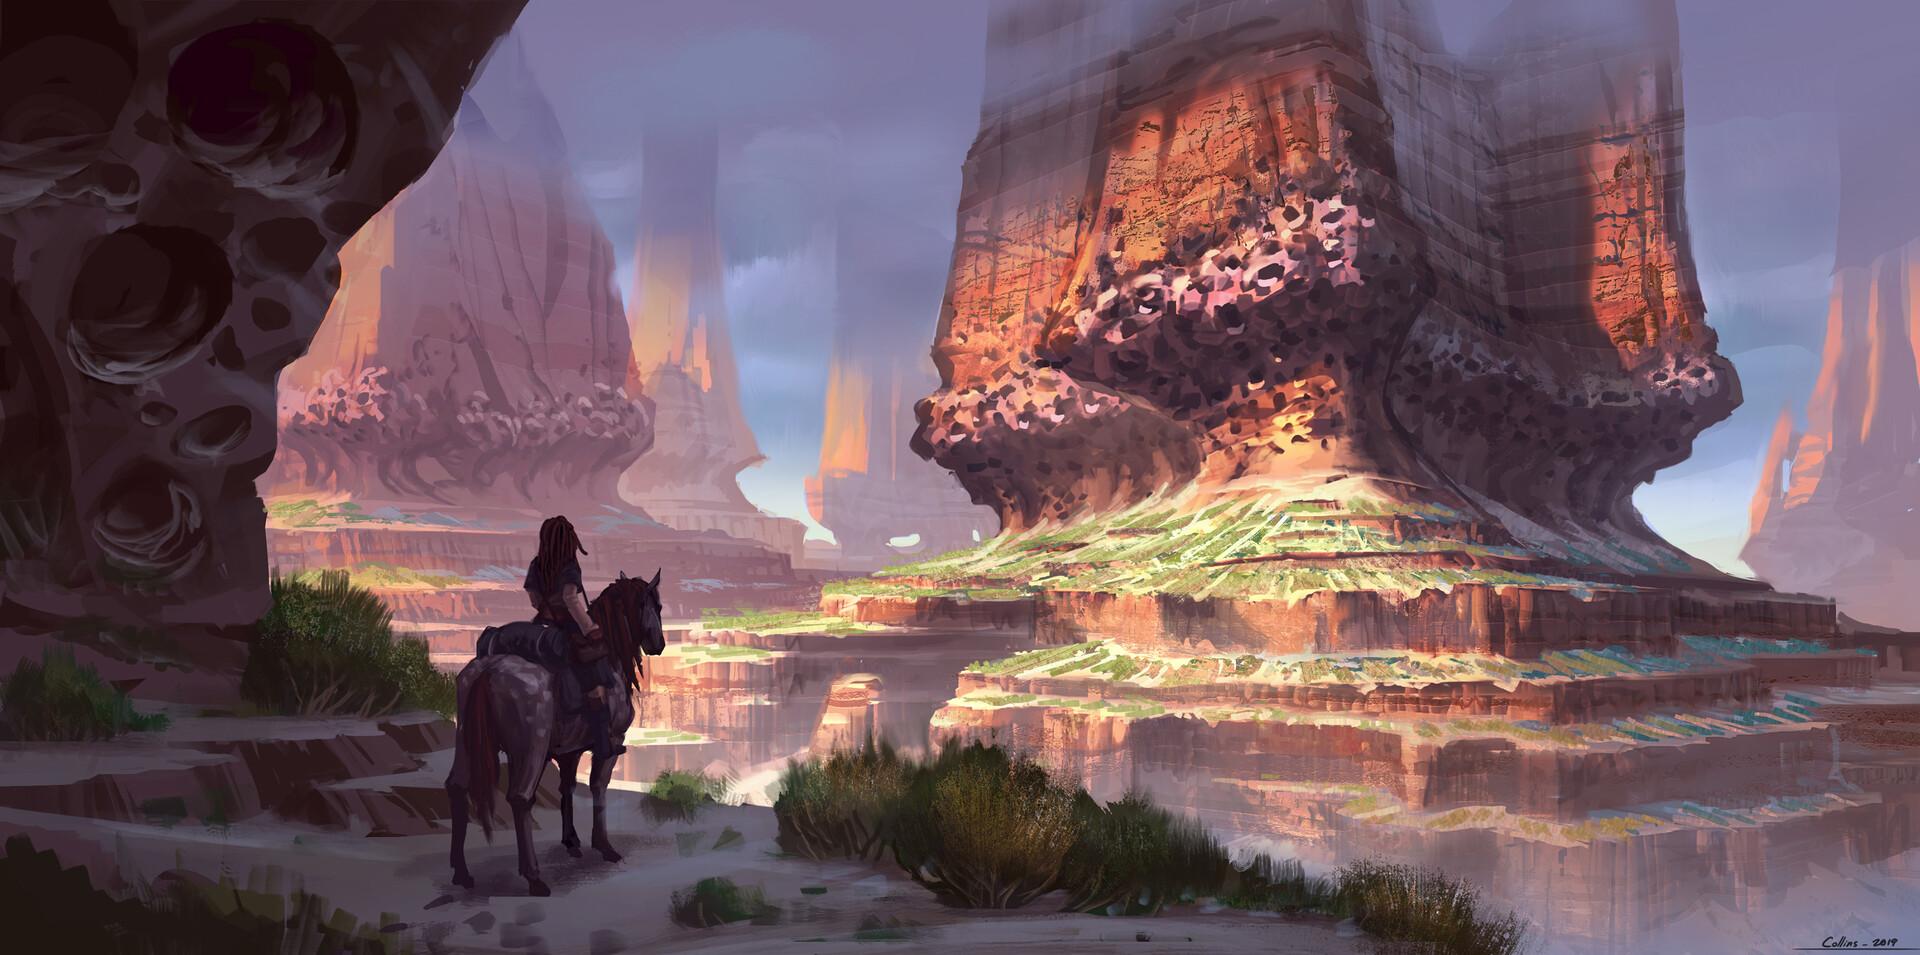 andrew-collins-desert-biome-final.jpg